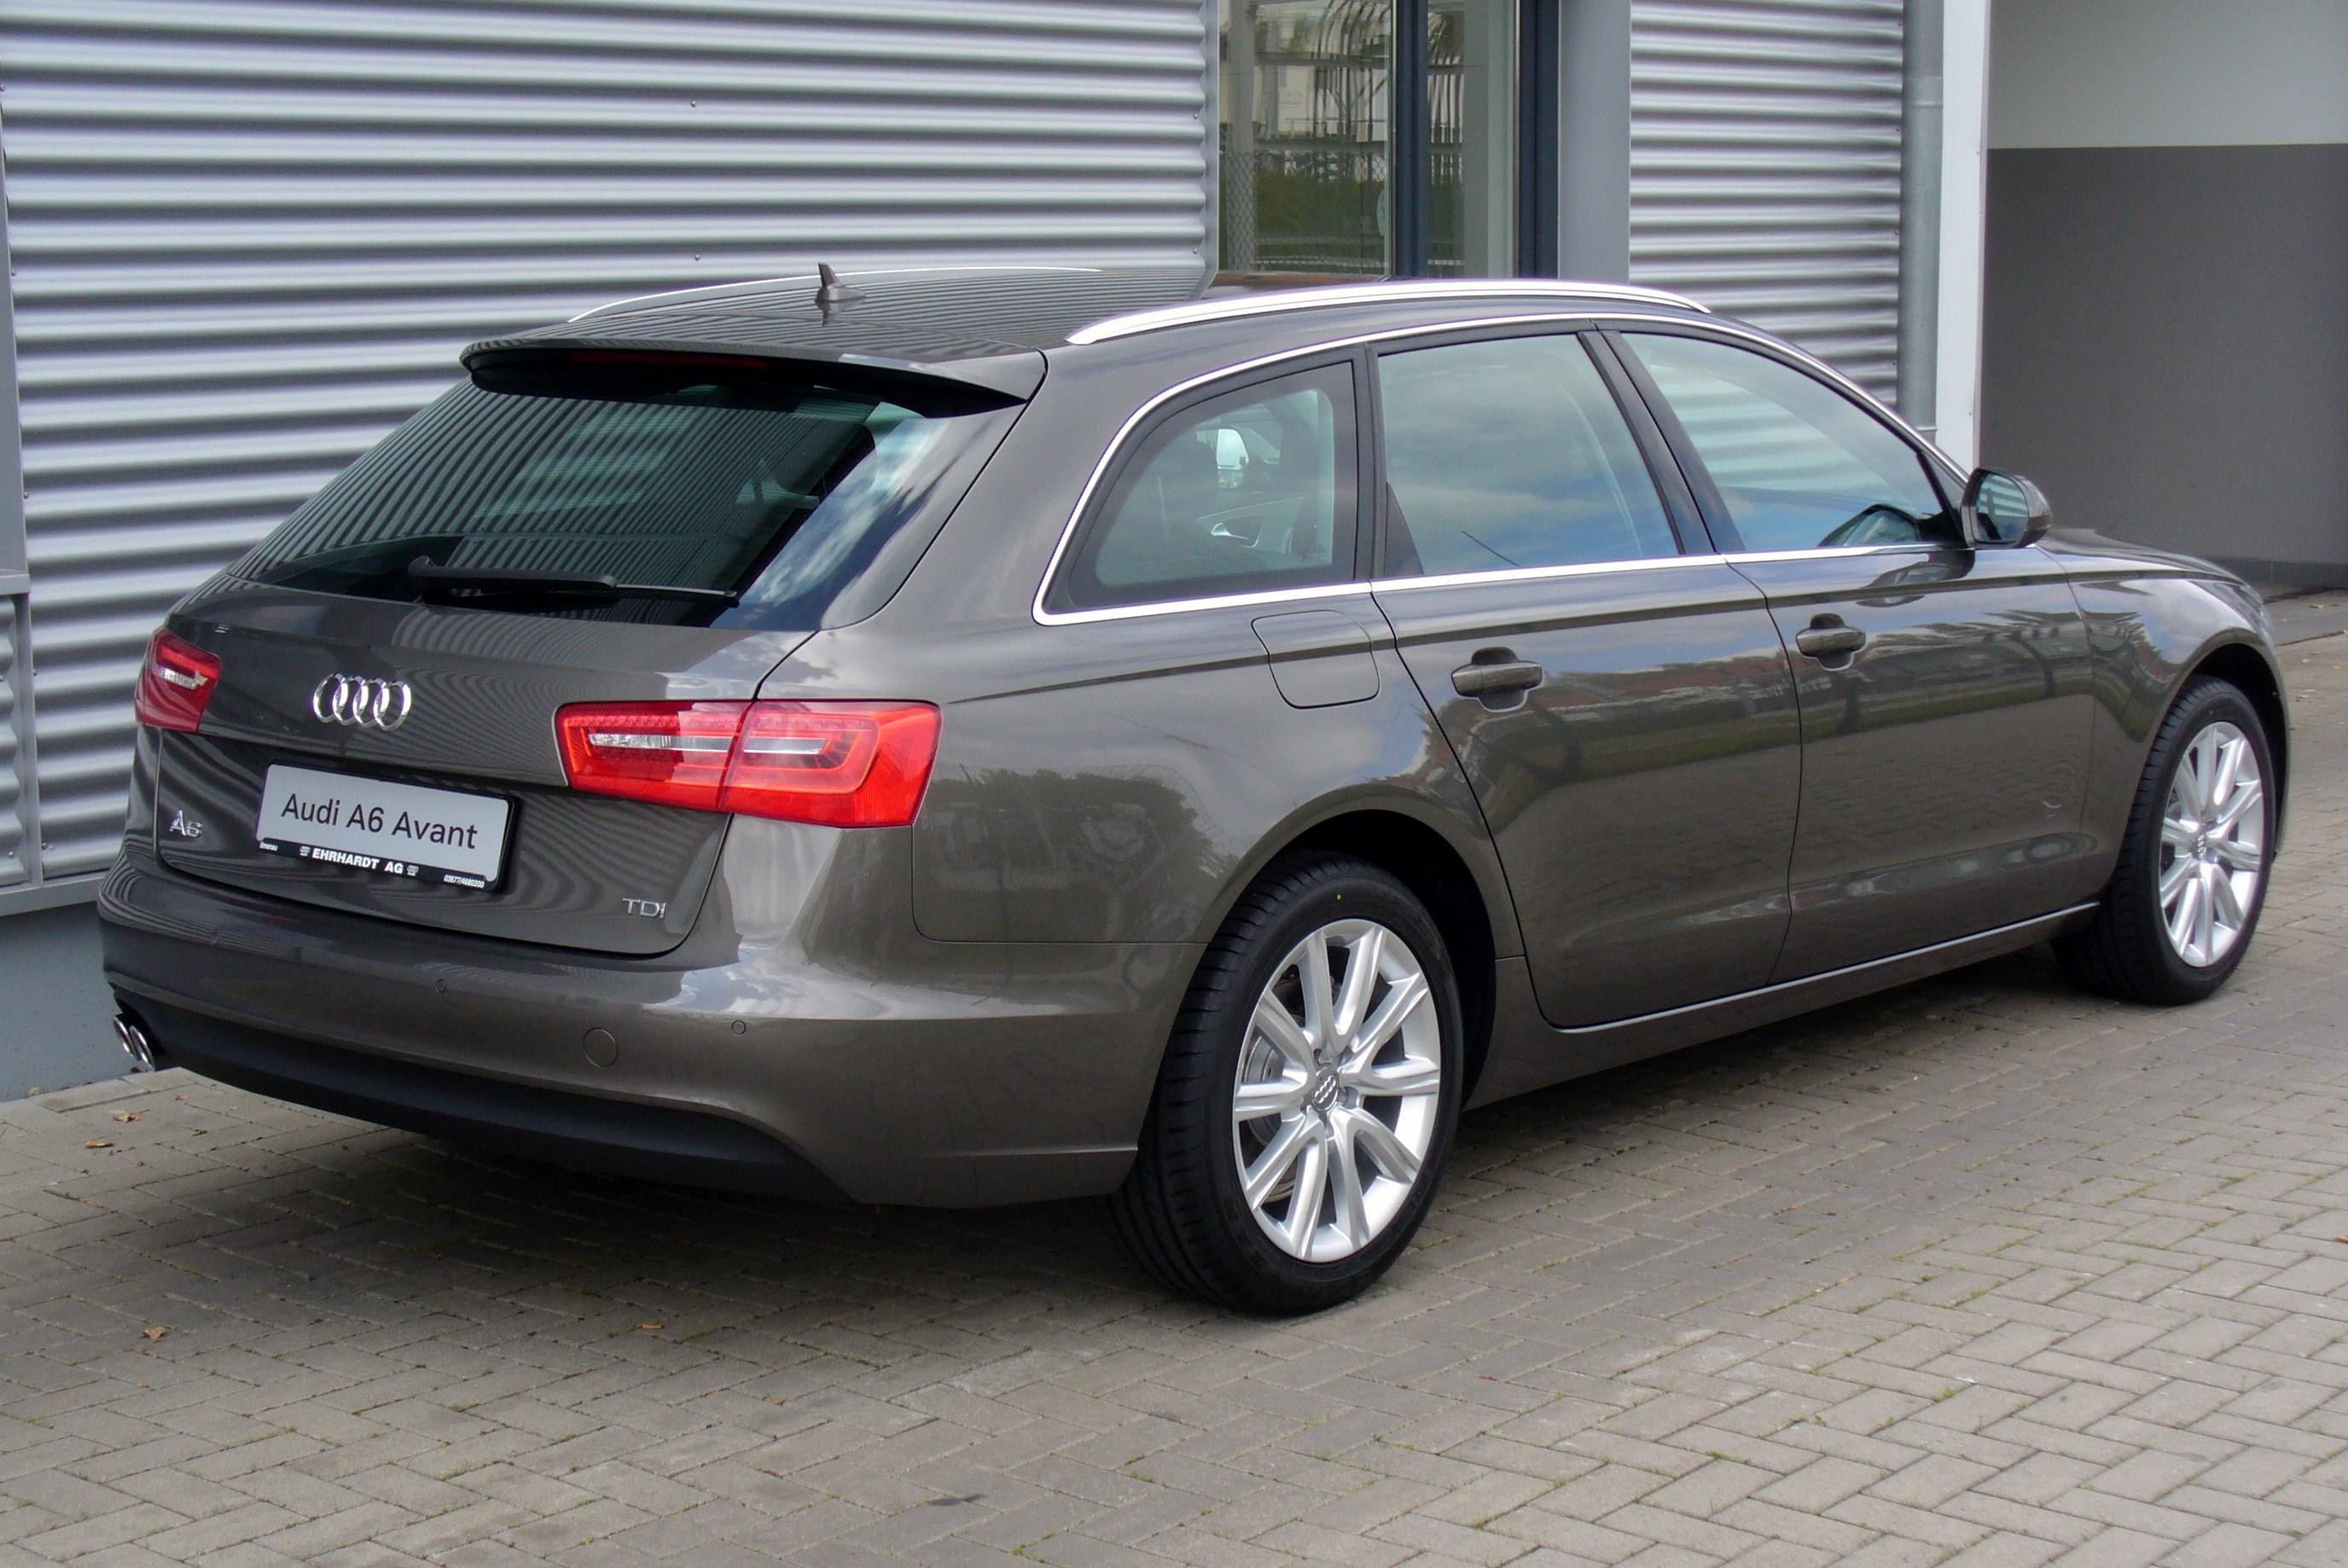 Audi A Black Metalic on range rover black, audi s8 black, mercedes-benz cl550 black, audi black edition, audi s5 black, honda accord sedan black, mazda mazda3 black, audi s6 black, audi tt black, audi a4, 2016 audi rs black, audi b7 black, mercedes-benz e350 black, audi a7 black, audi s7 black, audi a5, audi a8, audi a3, volkswagen passat tdi black, audi q5,